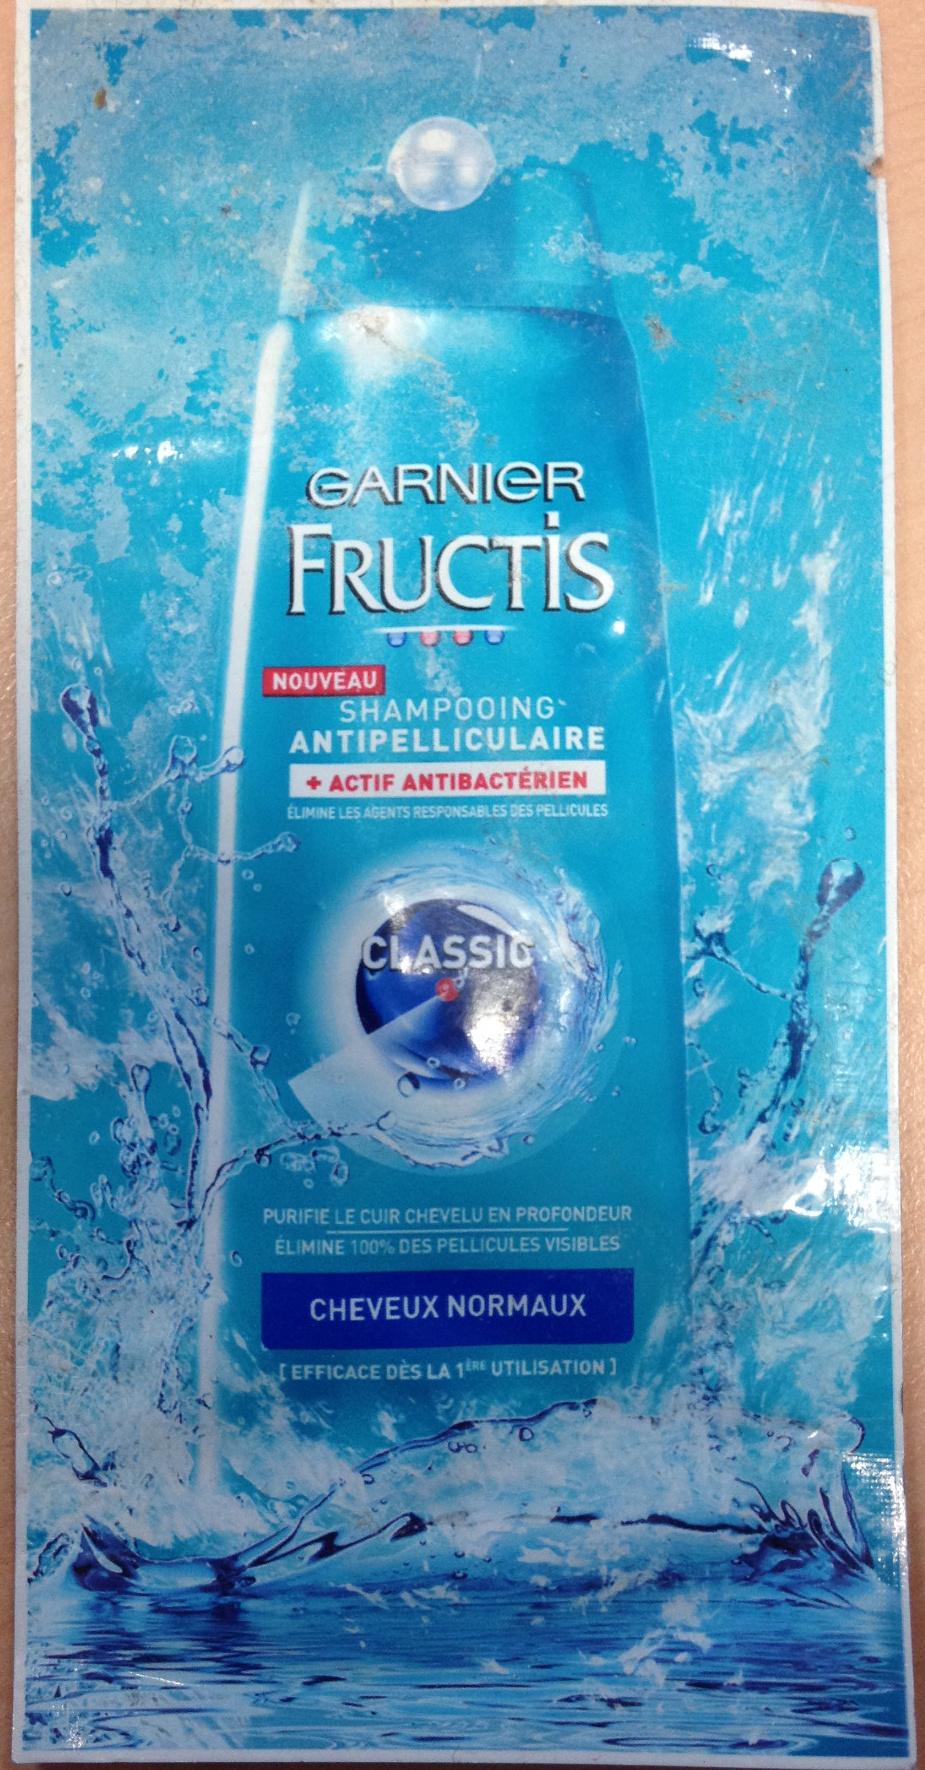 Fructis Classic - Produit - fr